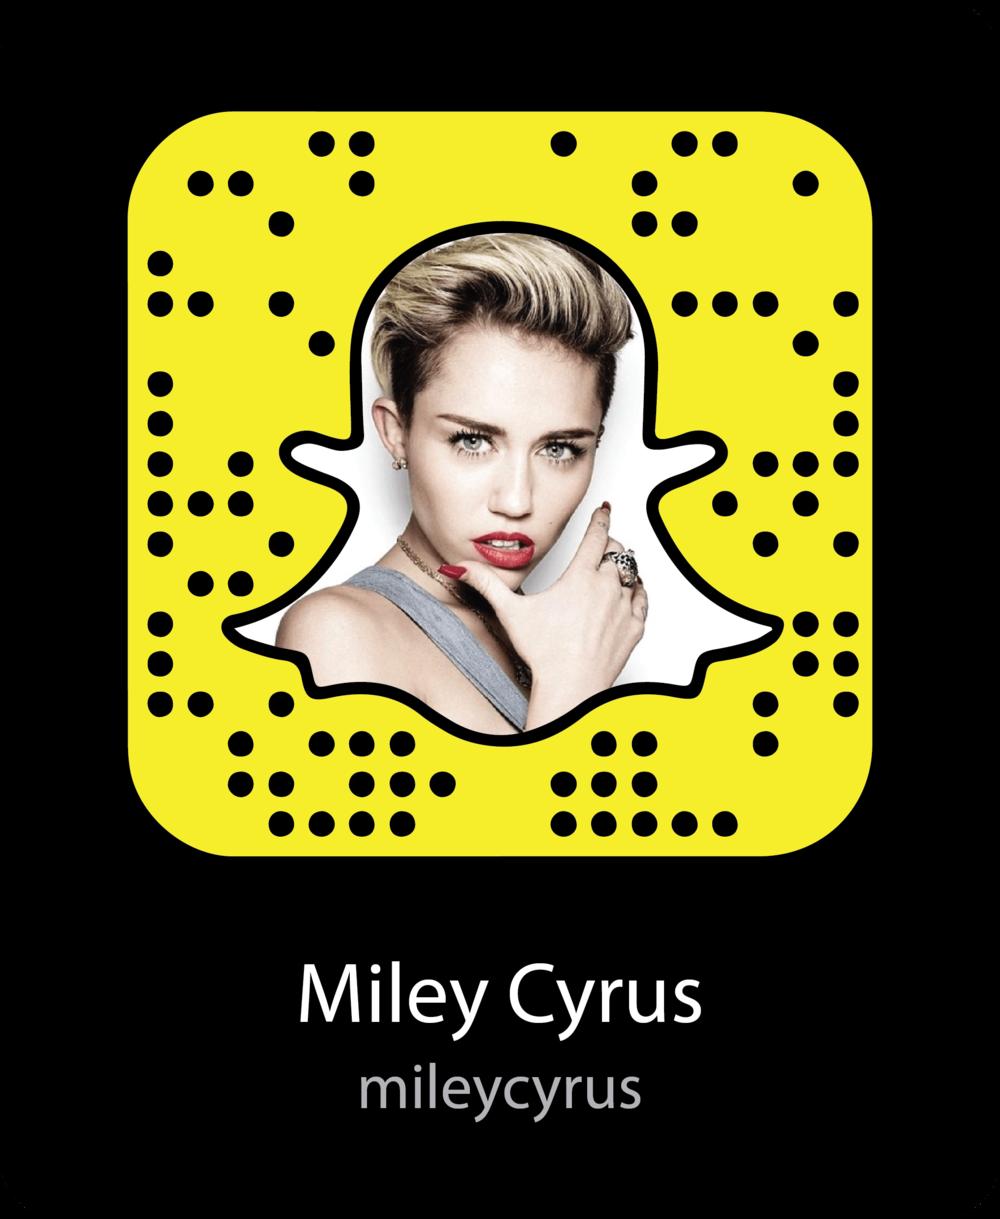 miley-cyrus-celebrity-snapchat-snapcode